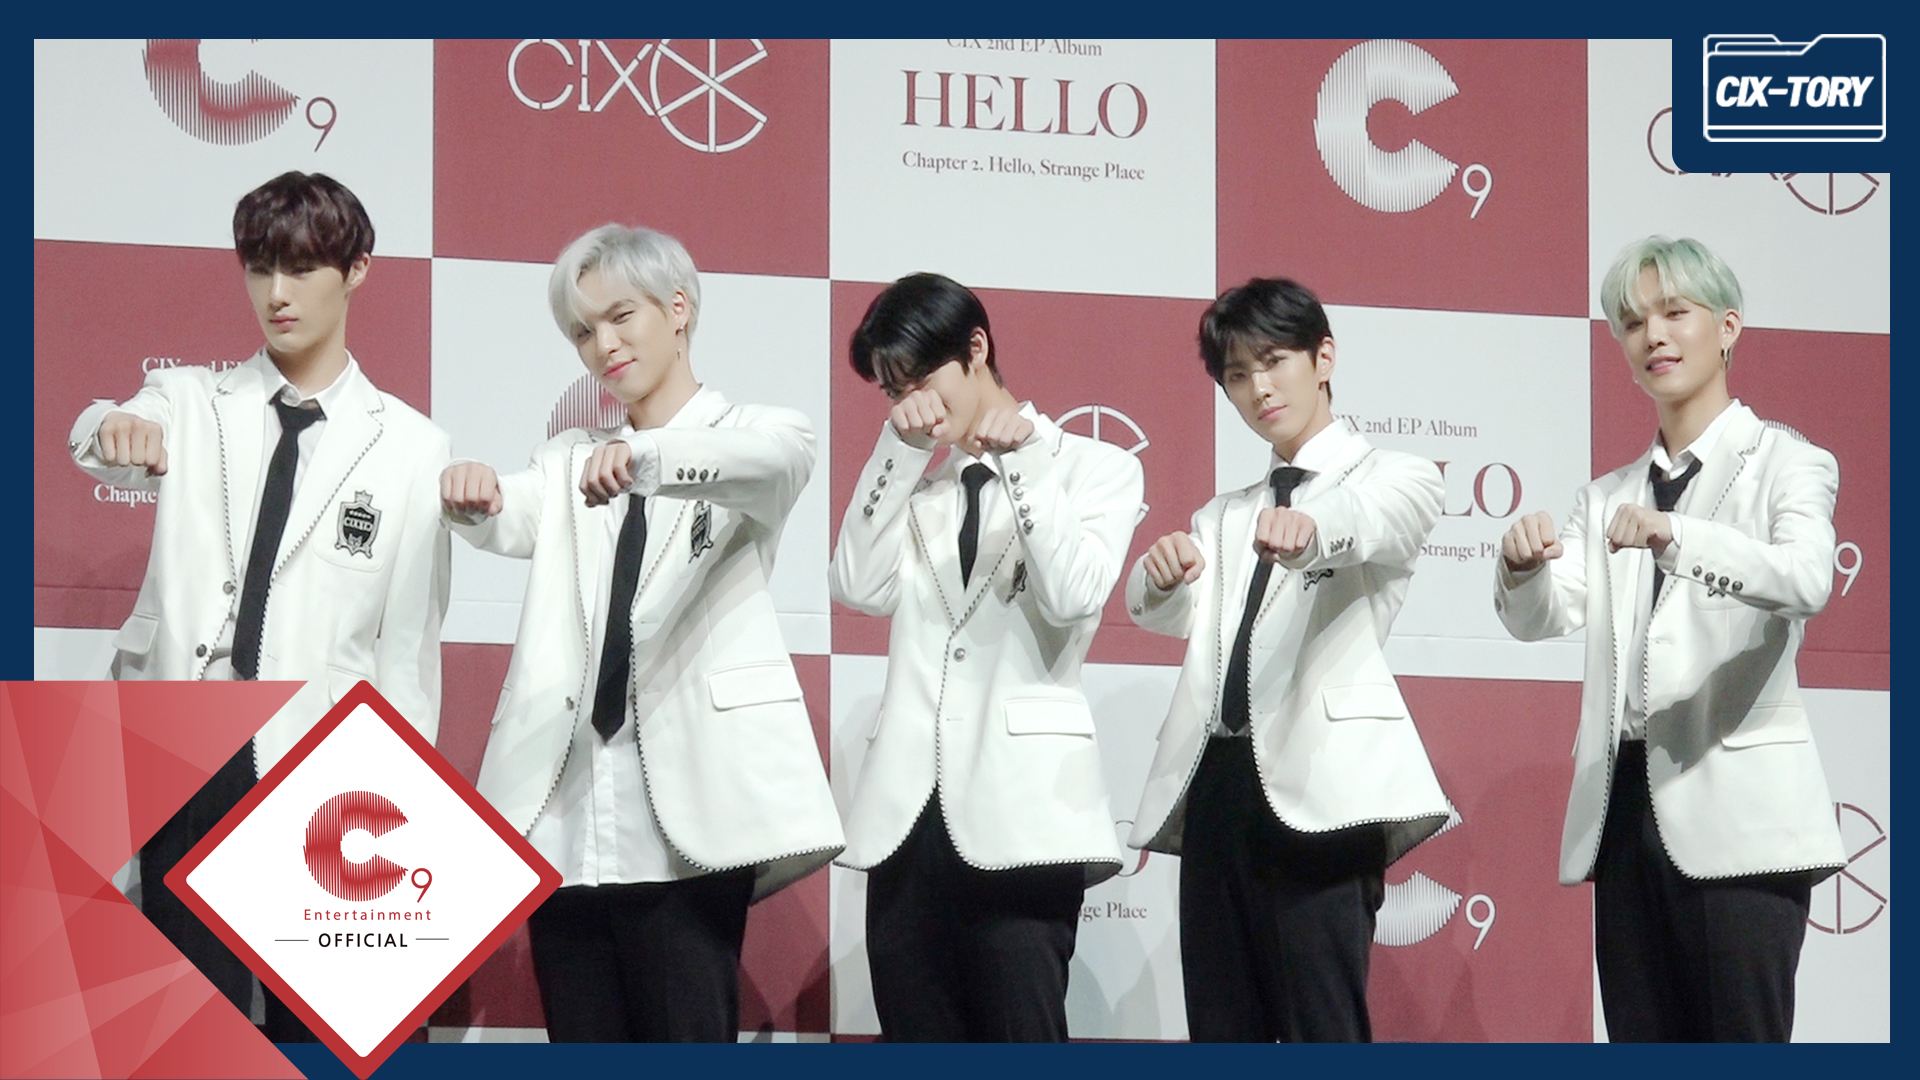 [CIX-tory] STORY.20 CIX 2nd EP Album 'Hello, Strange Place' 언론 쇼케이스 현장